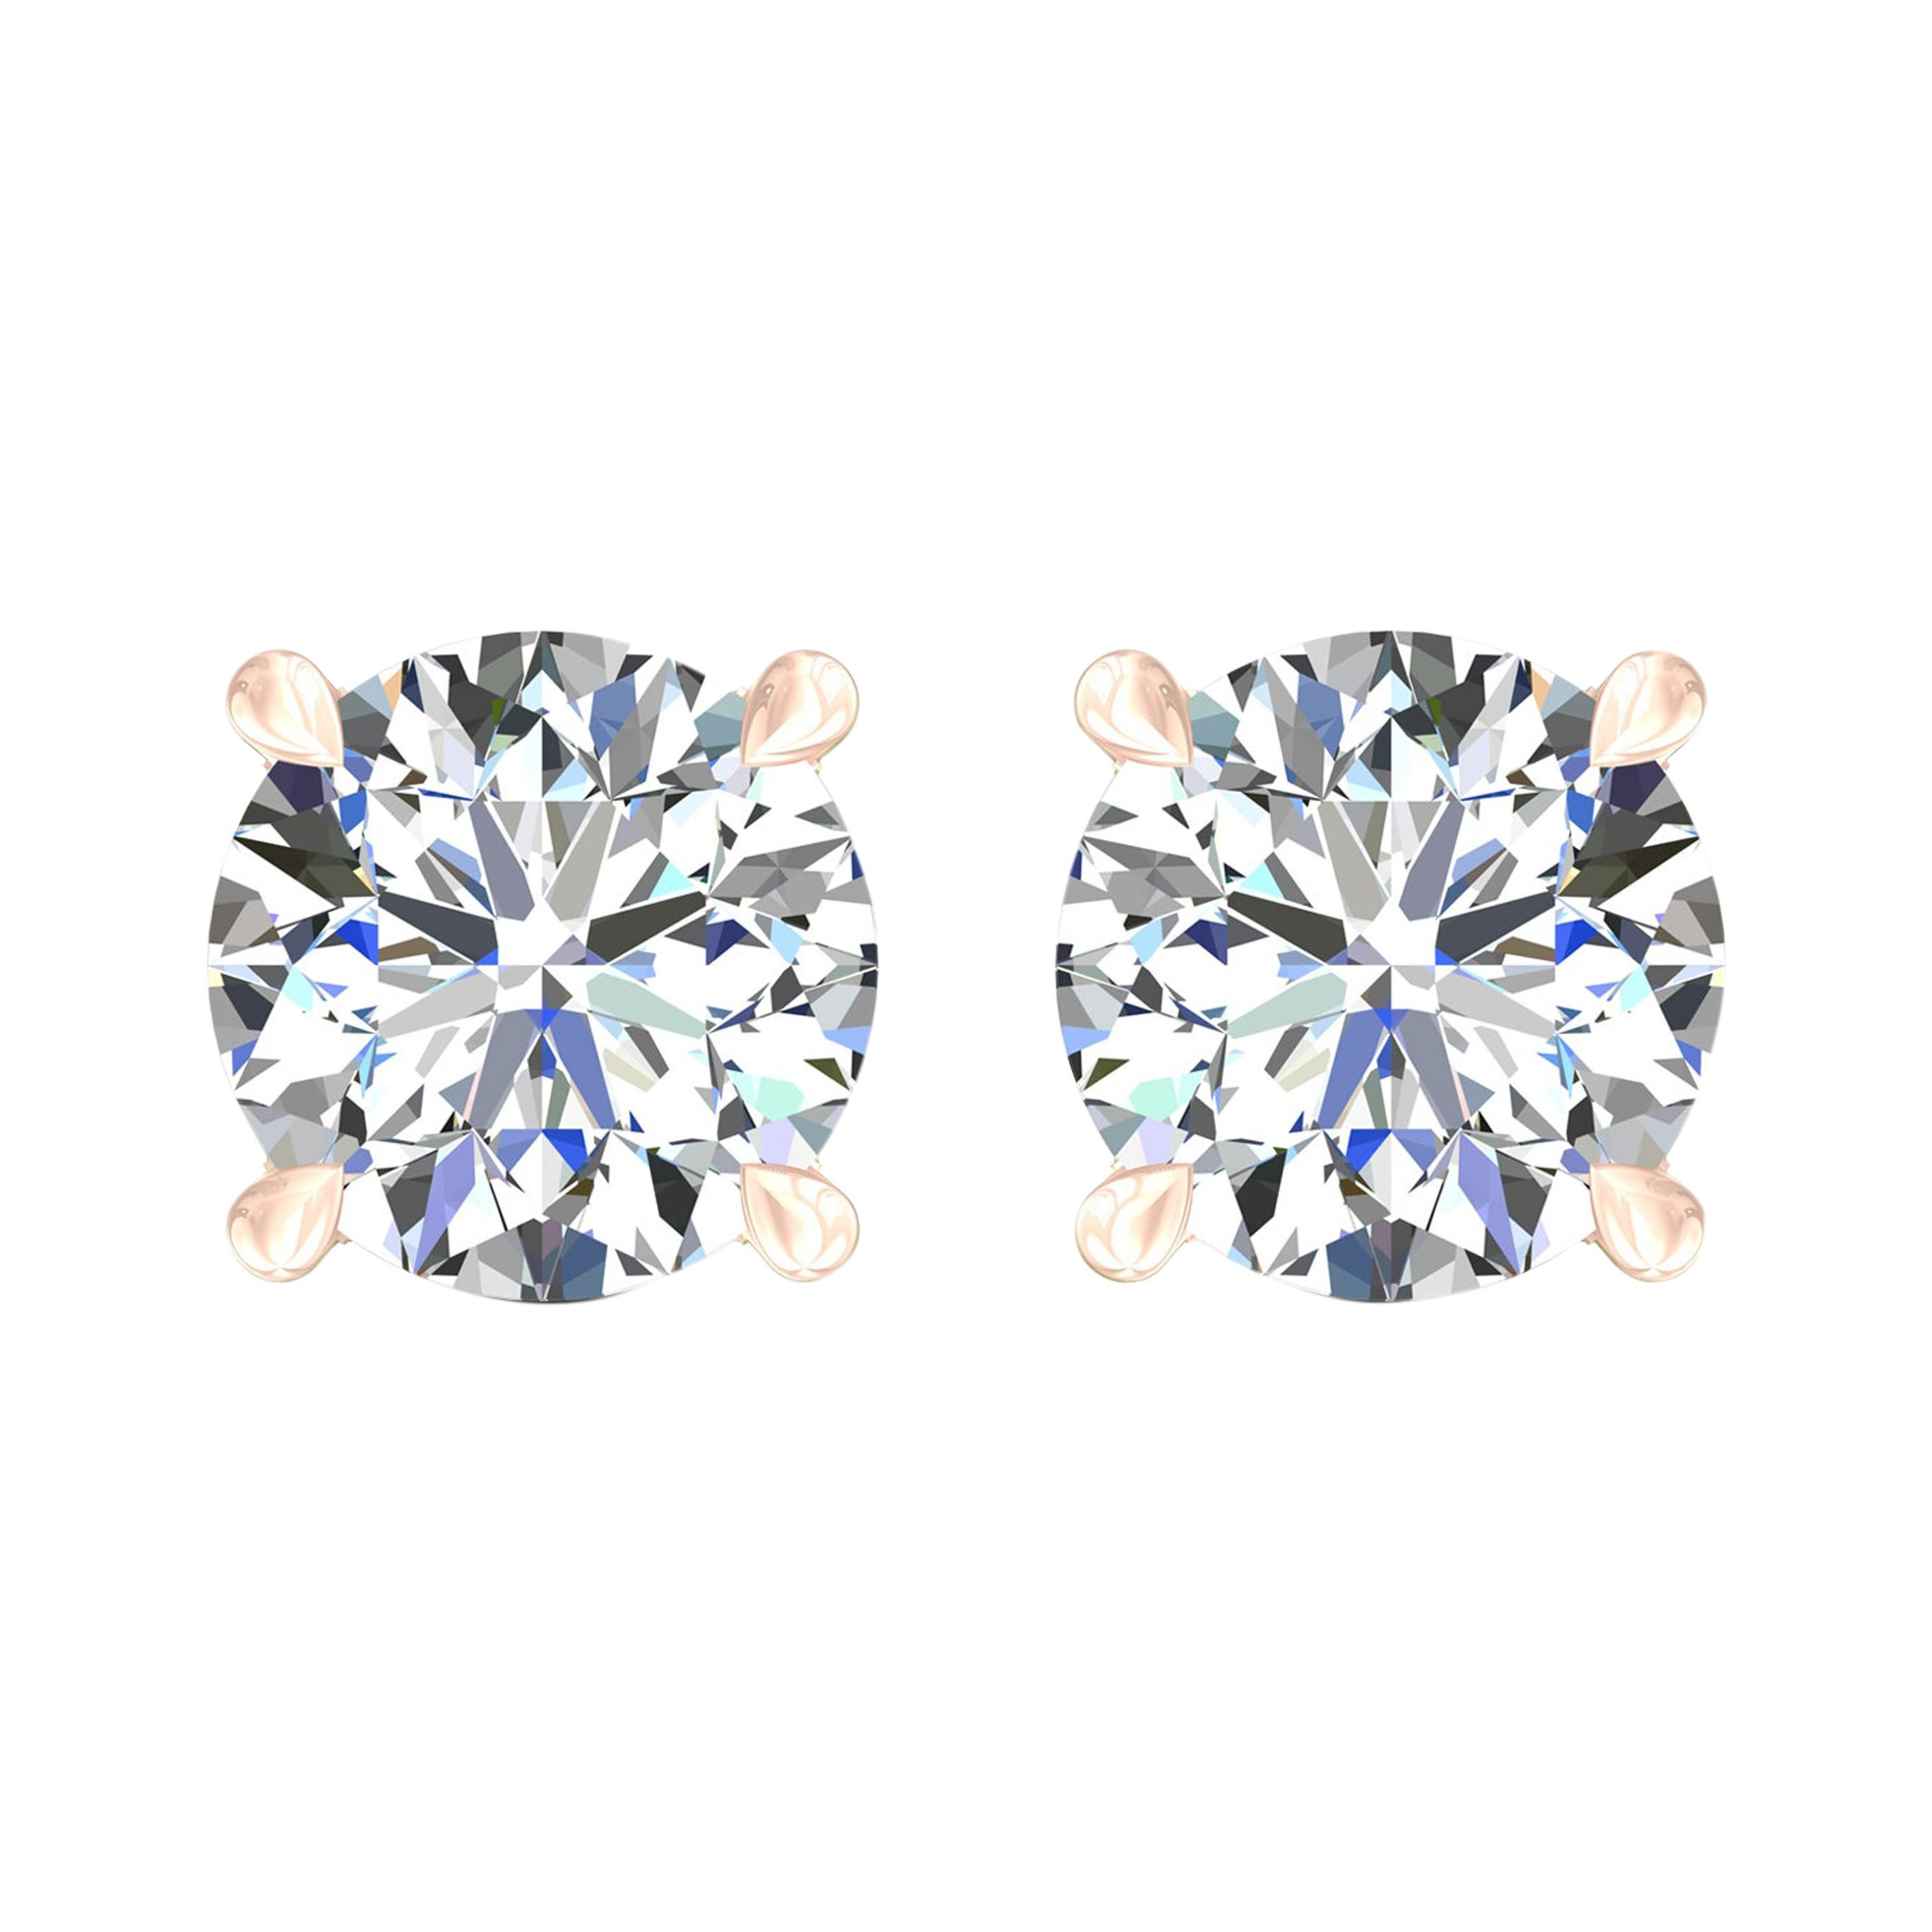 Harakh GIA Certified 0.54Carat F Color VVS1 Clarity 18 KT Diamond Stud Earrings